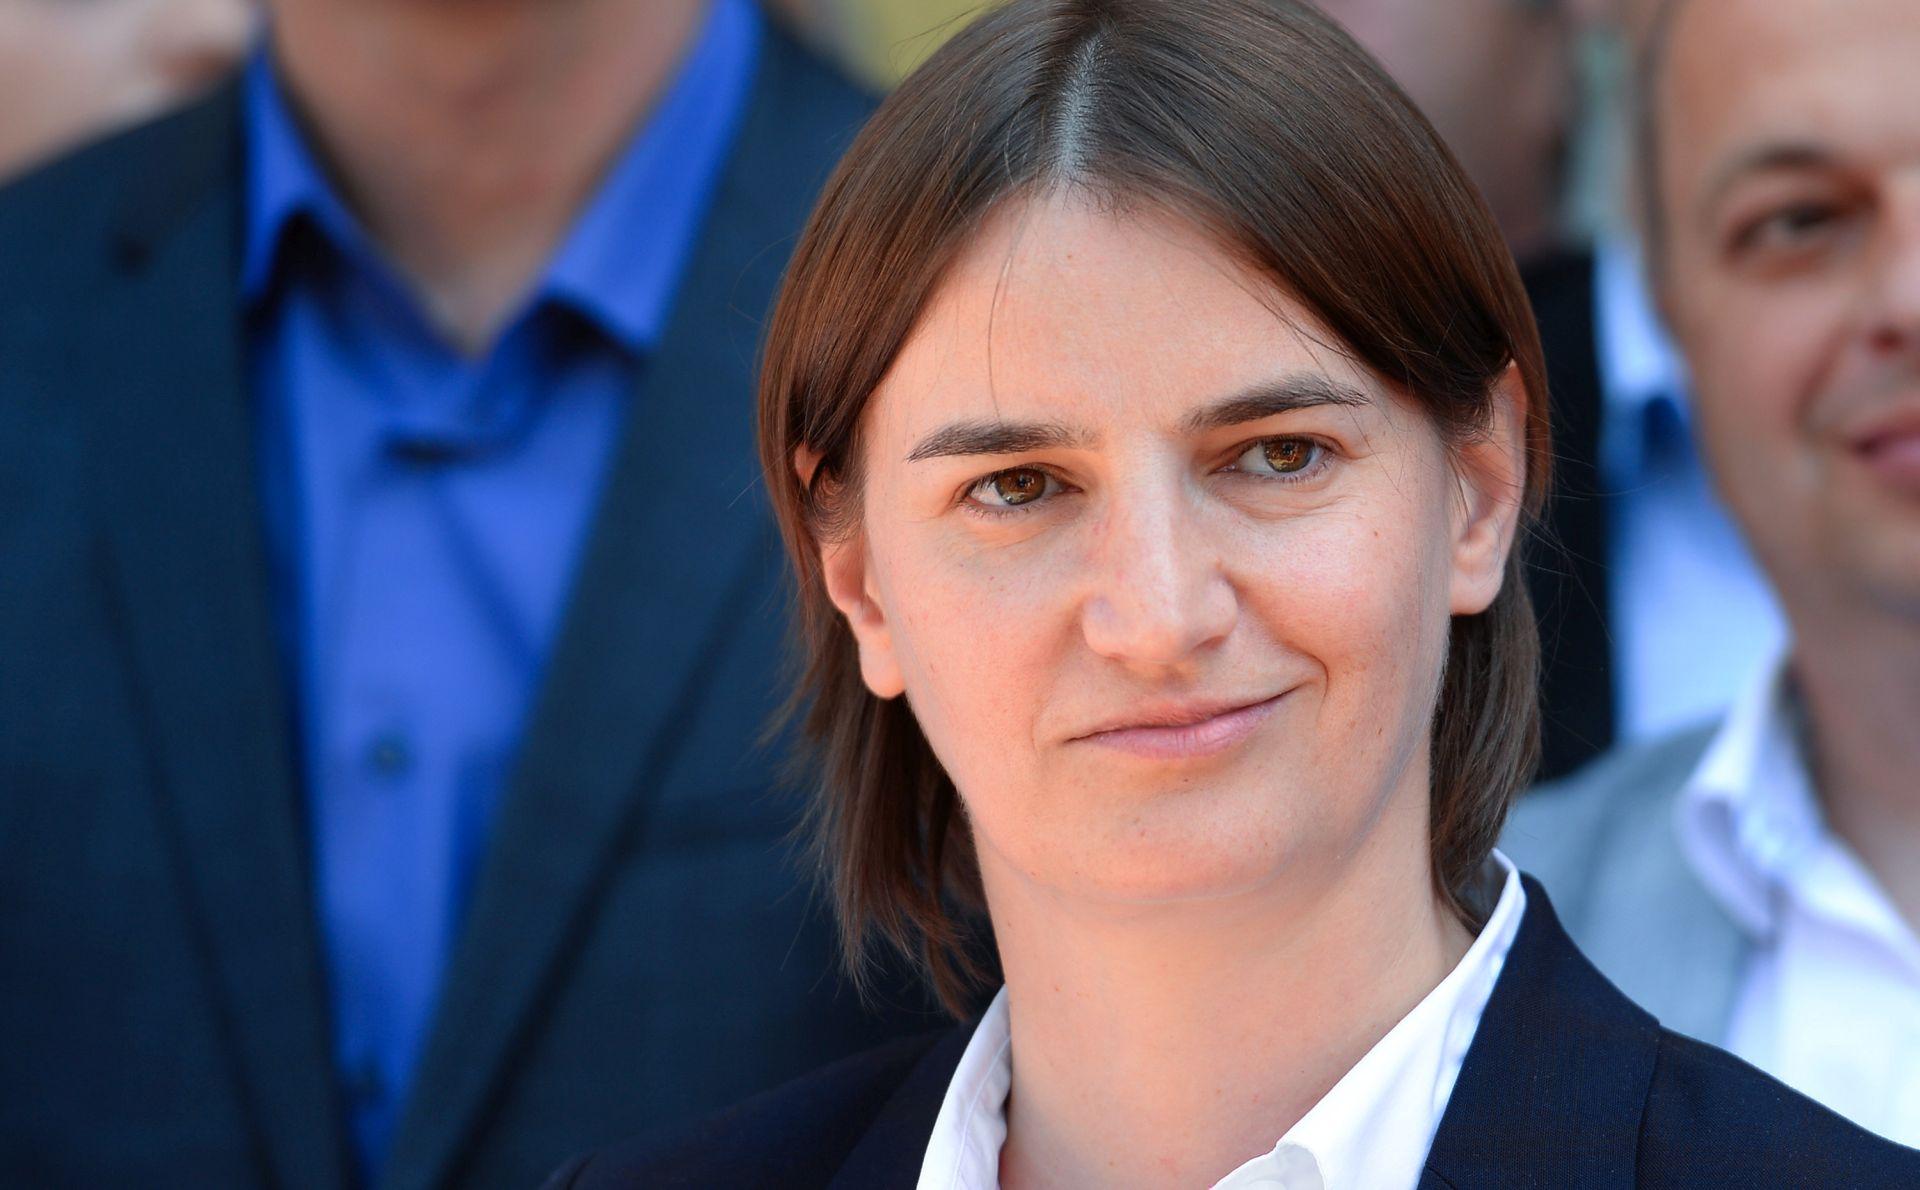 Slovenija i Srbija istaknule dobre i prijateljske odnose